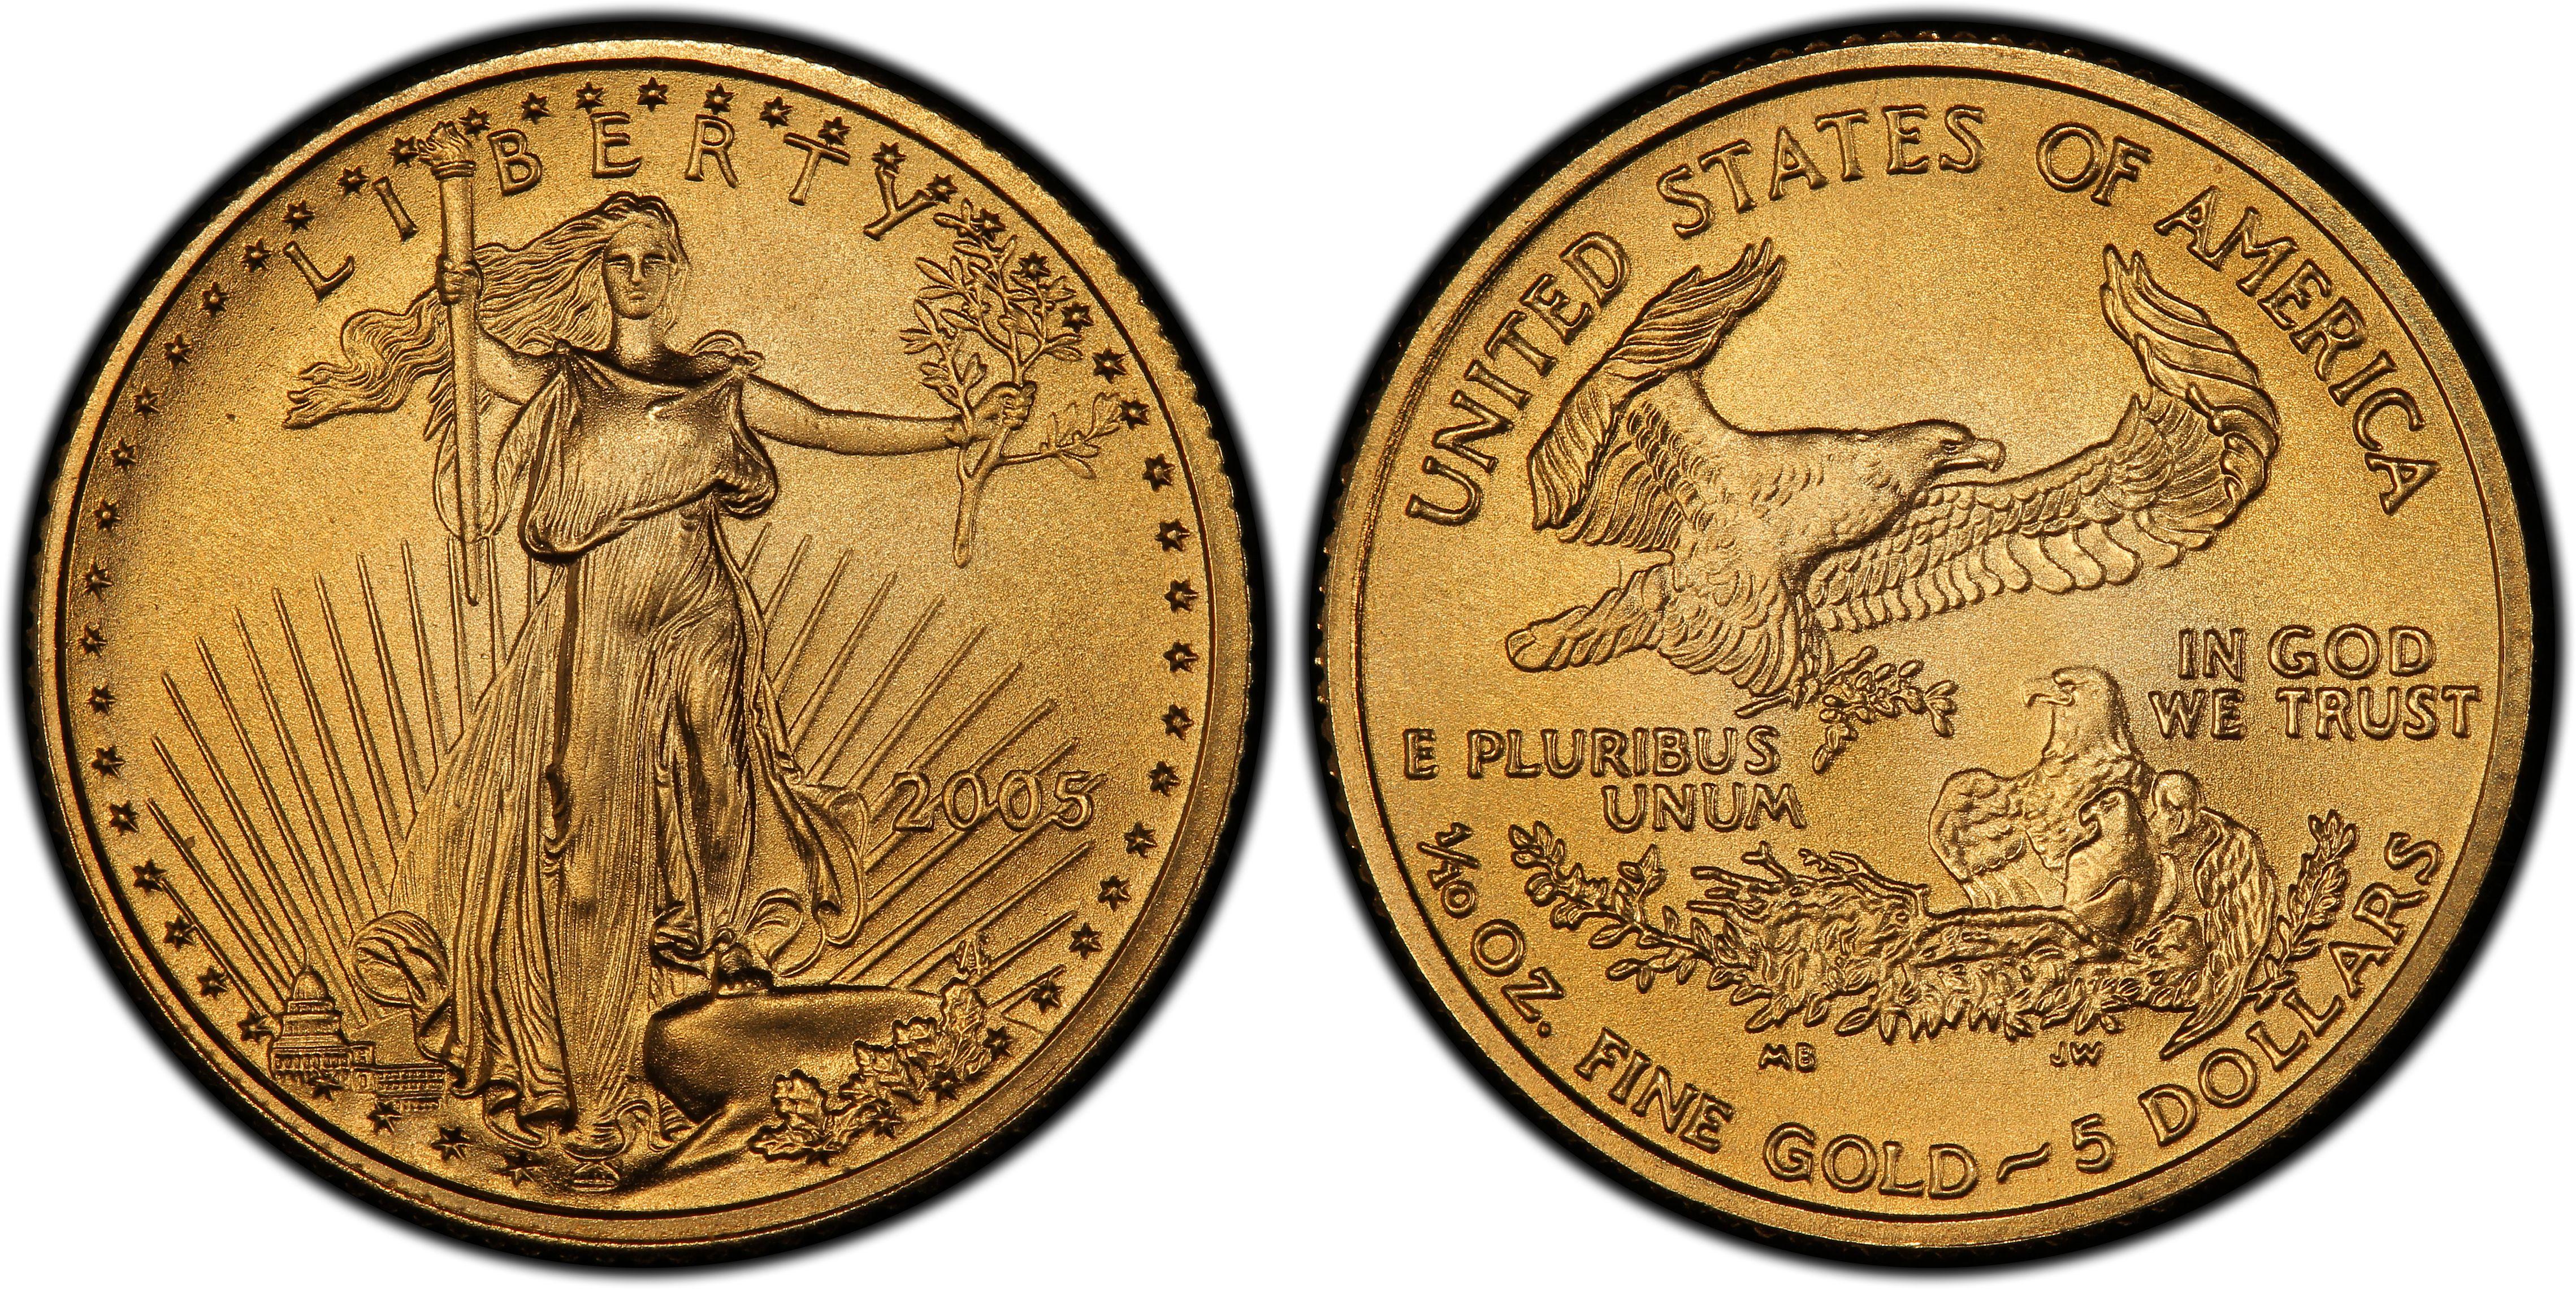 2005 GOLD AMERICAN EAGLE FIVE $5 DOLLAR COIN